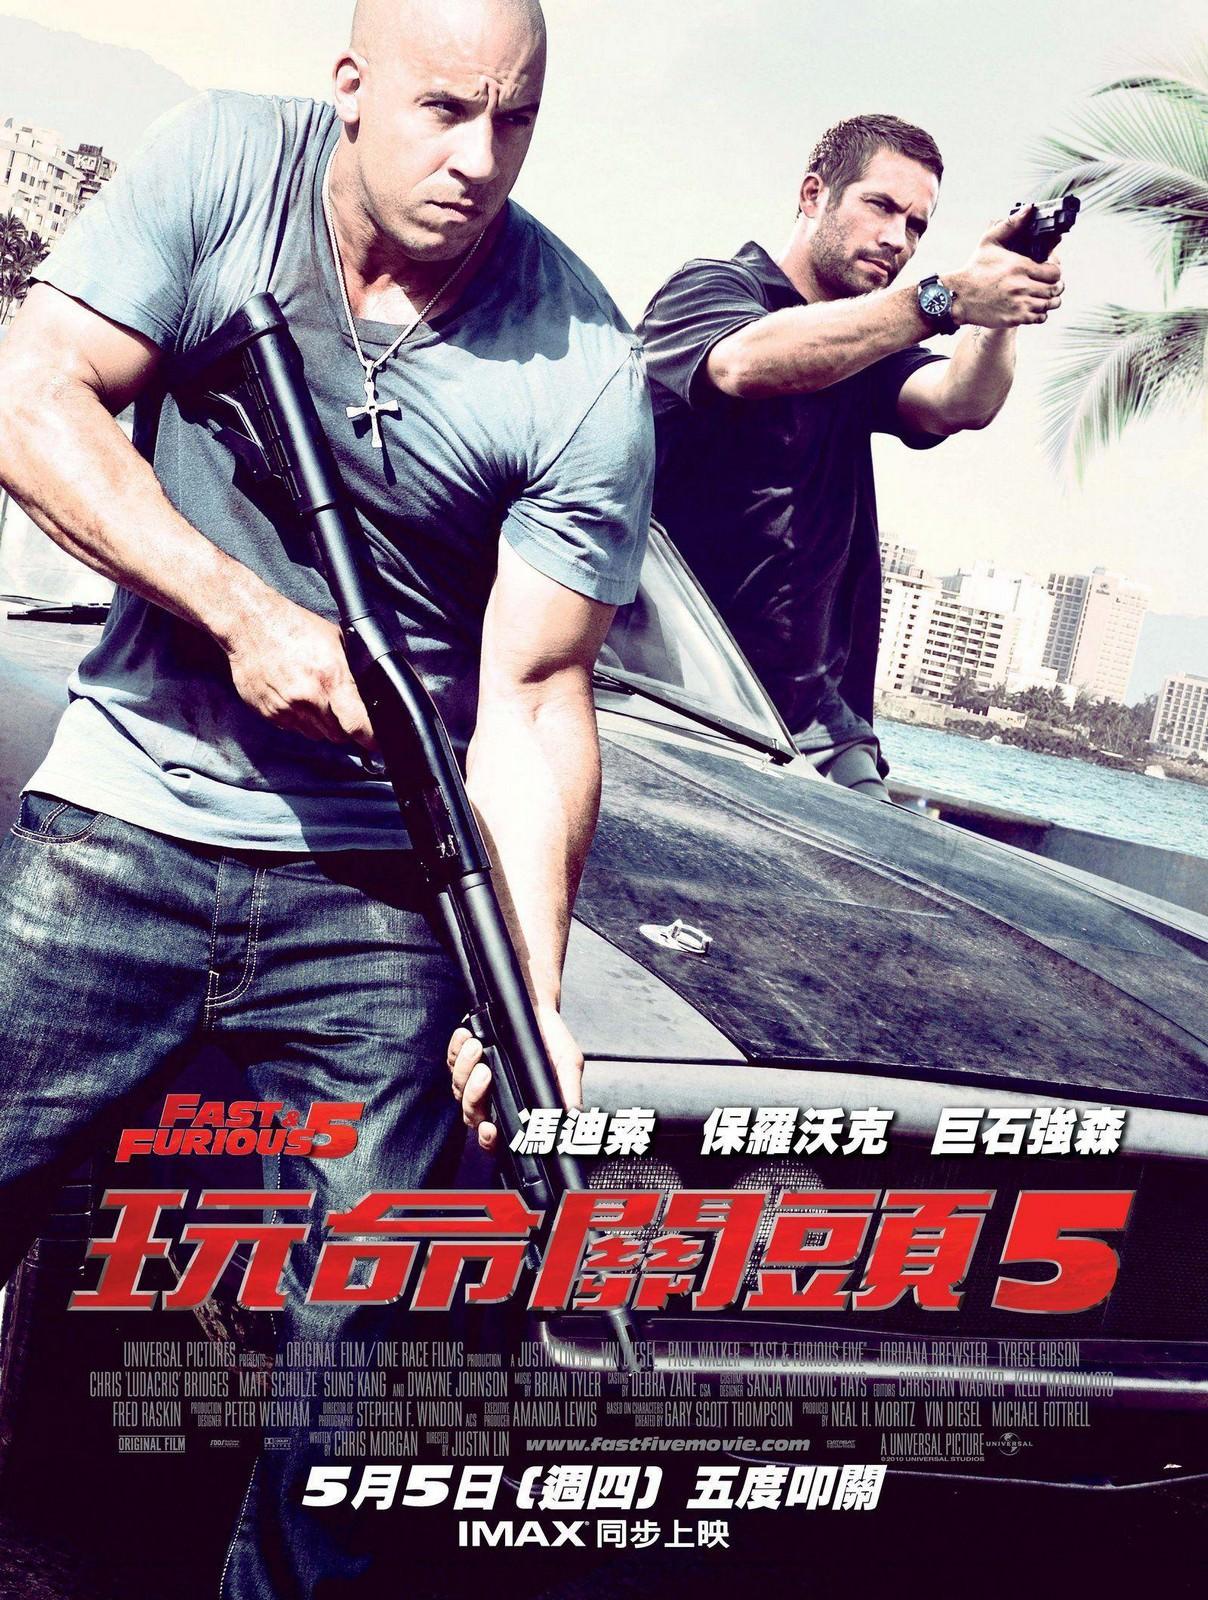 Movie, Fast Five(美國, 2011年) / 玩命關頭5(台灣) / 速度与激情5(中國) / 狂野時速5(香港), 電影海報, 台灣